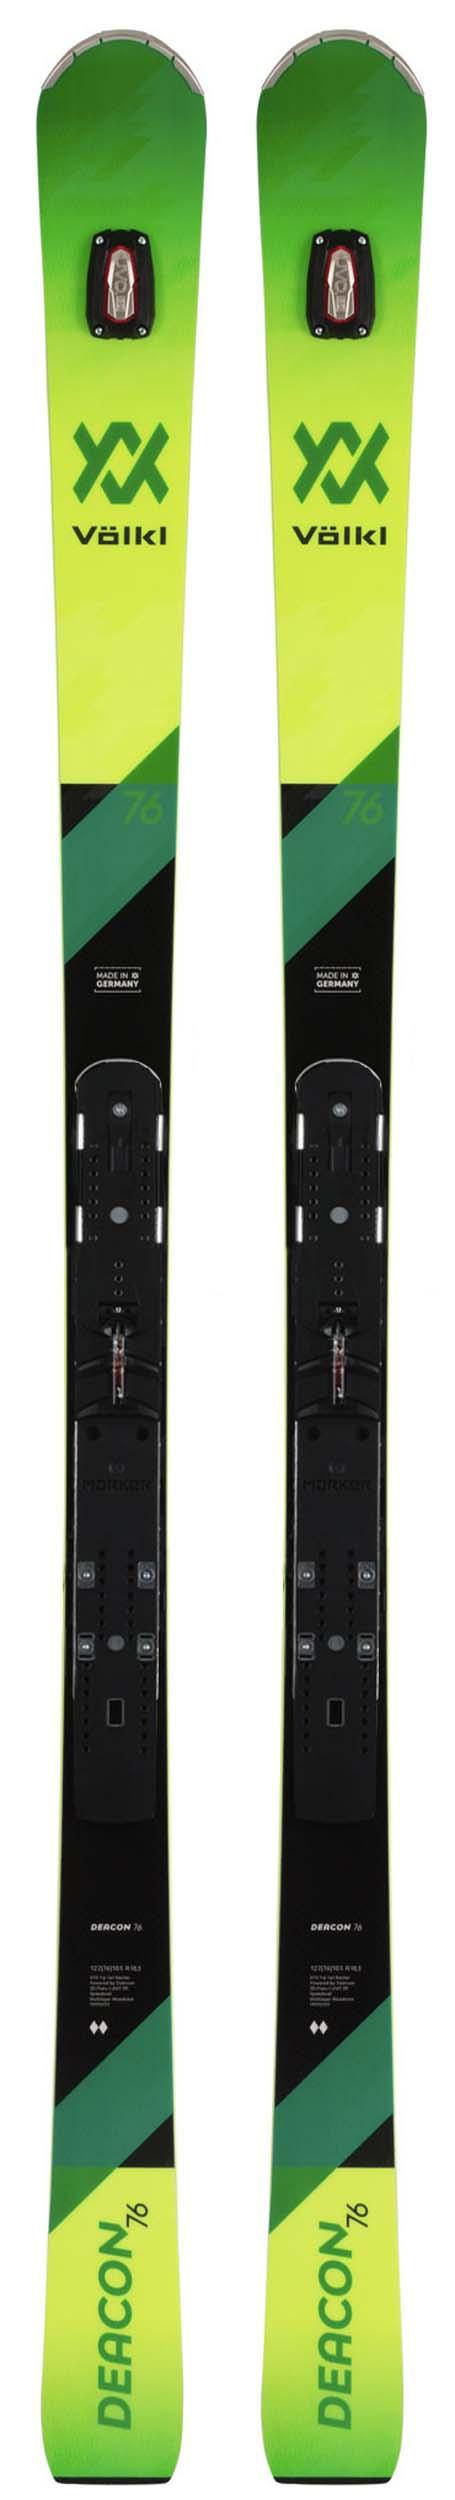 Volkl 2020 Deacon 76 Pro Skis w/Marker Piston Plates NEW !! 176,181cm